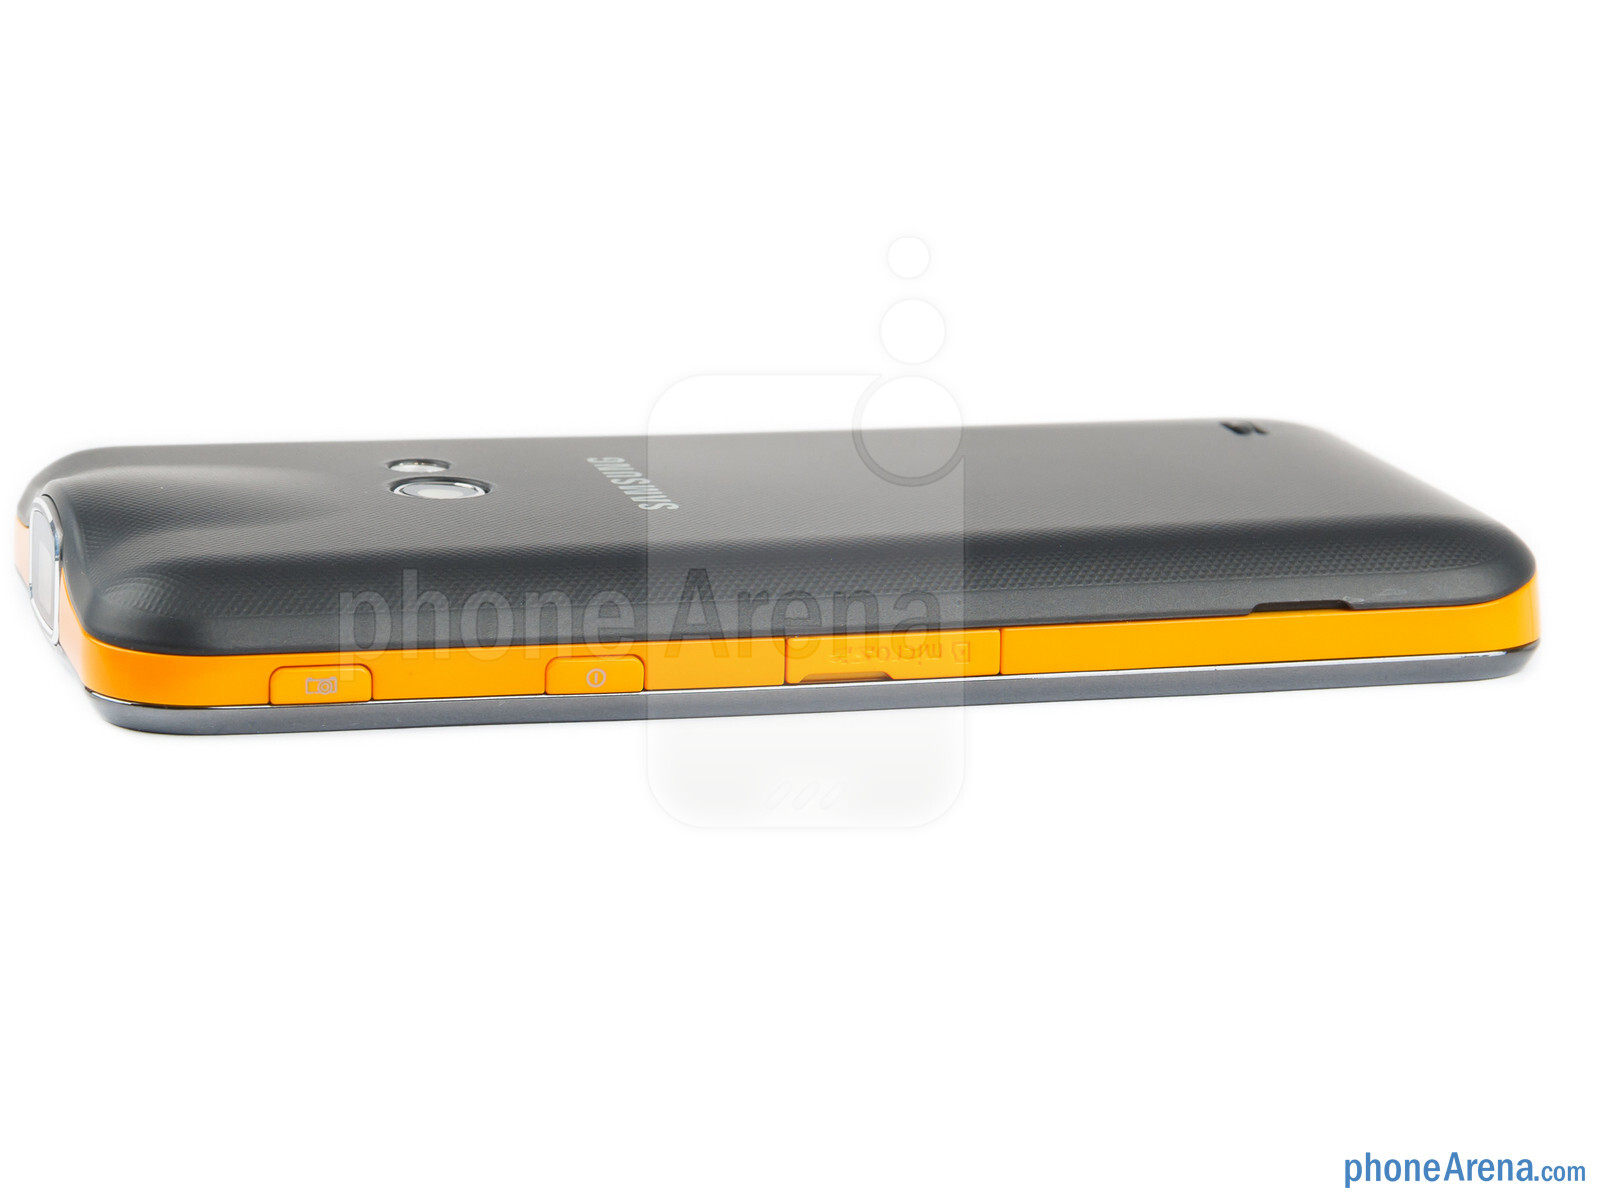 Samsung Galaxy Beam Review